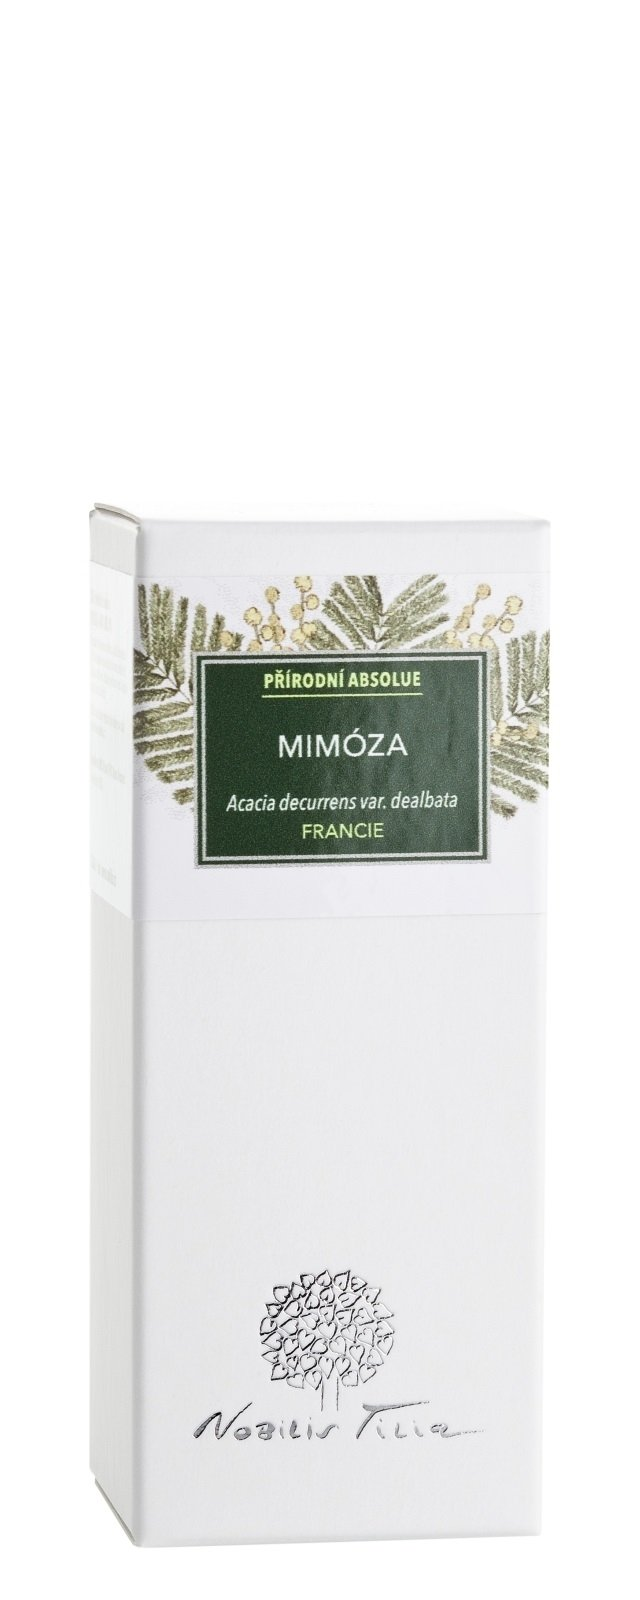 Mimóza, absolue 30%: 1 ml